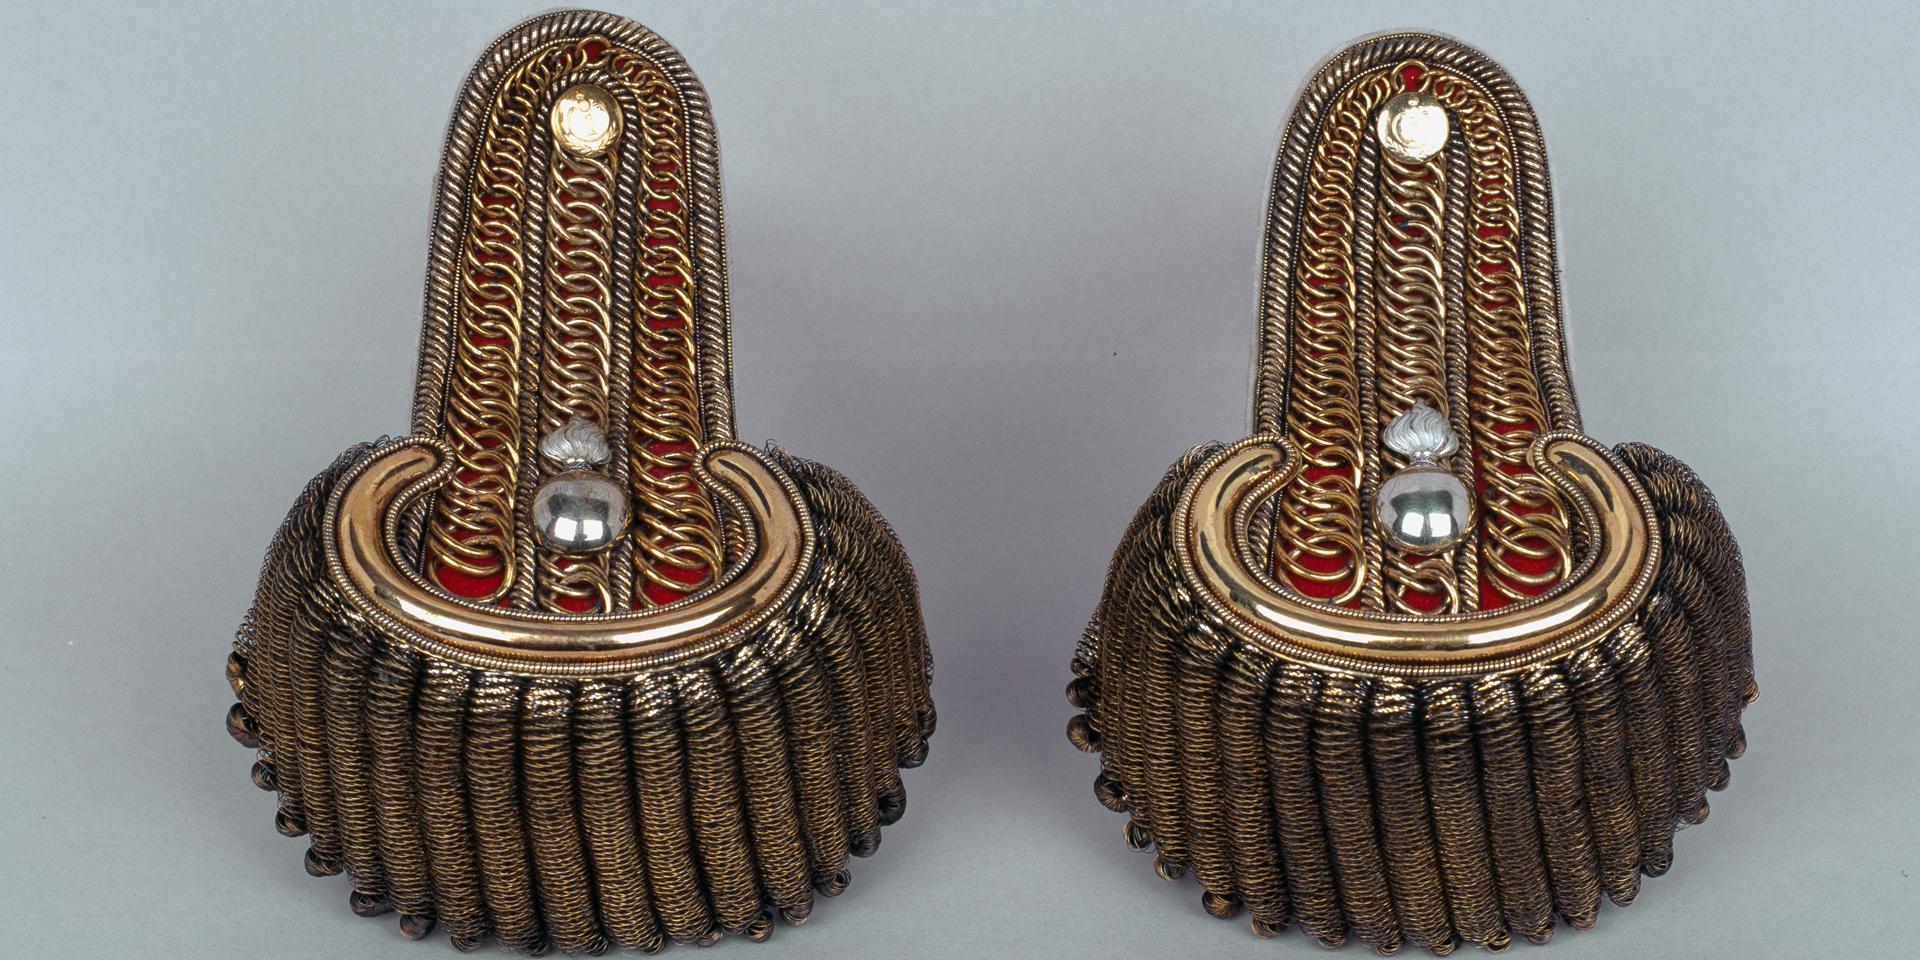 Captain's epaulettes, worn by Captain James Cunningham Grant-Duff, 1st or Grenadier Regiment Bombay Native Infantry, 1824